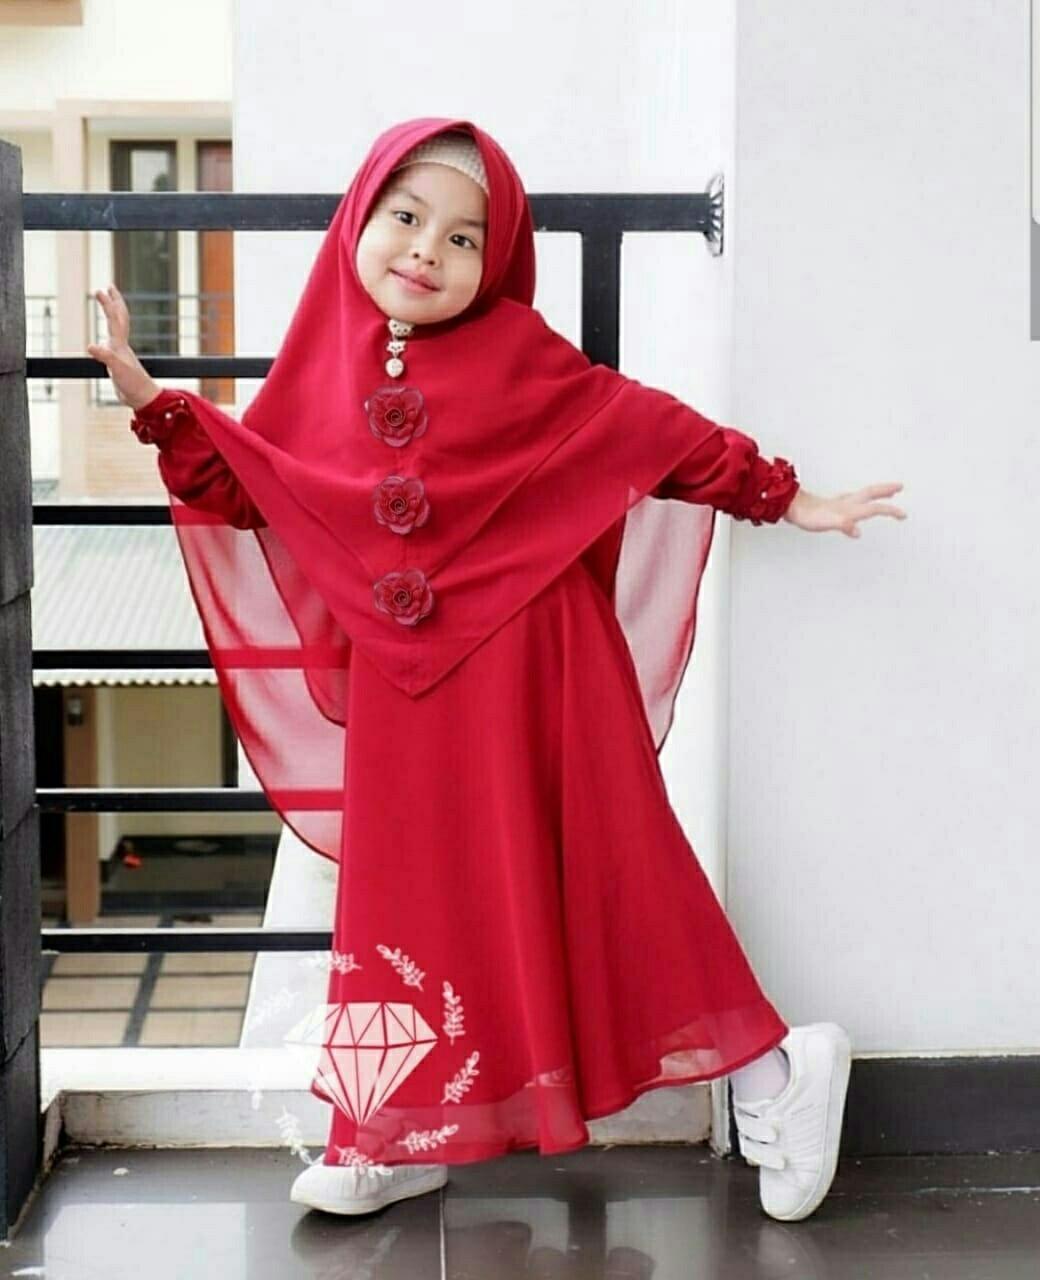 Honeyclothing Gamis Anak Emala / Dress Muslim Anak / Dress Anak Perempuan / Baju Muslim Anak By Honey Clothing.